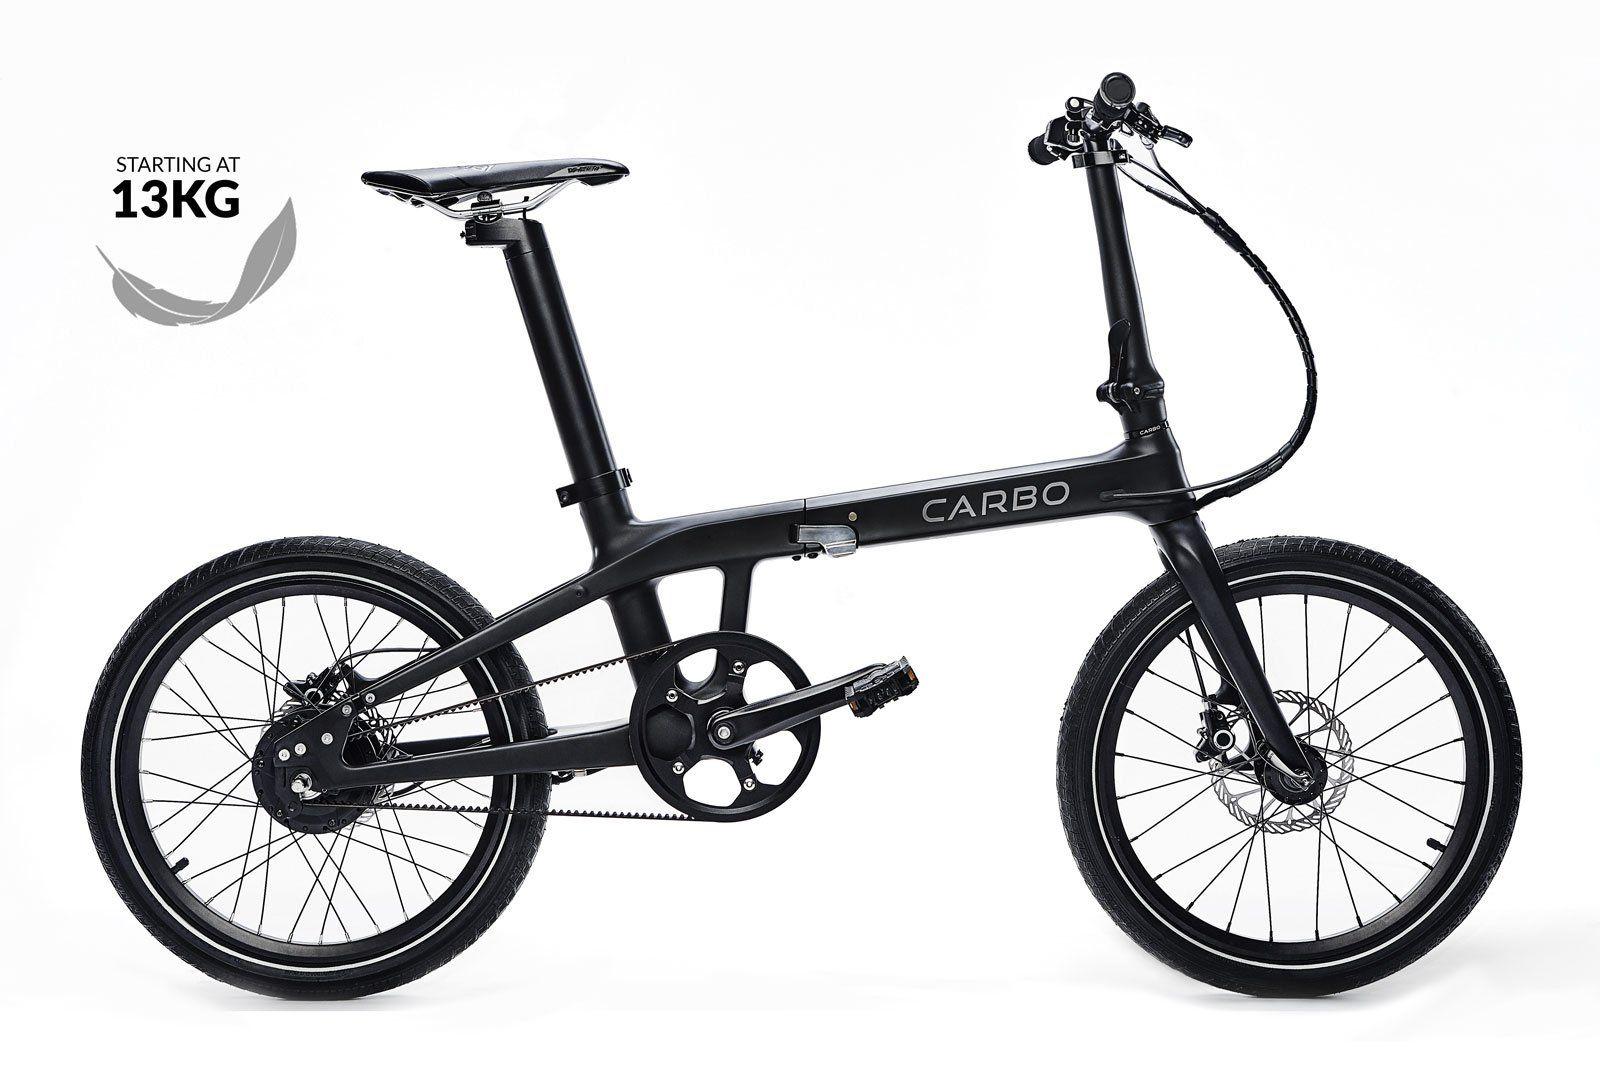 Carbo Electric Bike In 2020 Folding Electric Bike Electric Bike